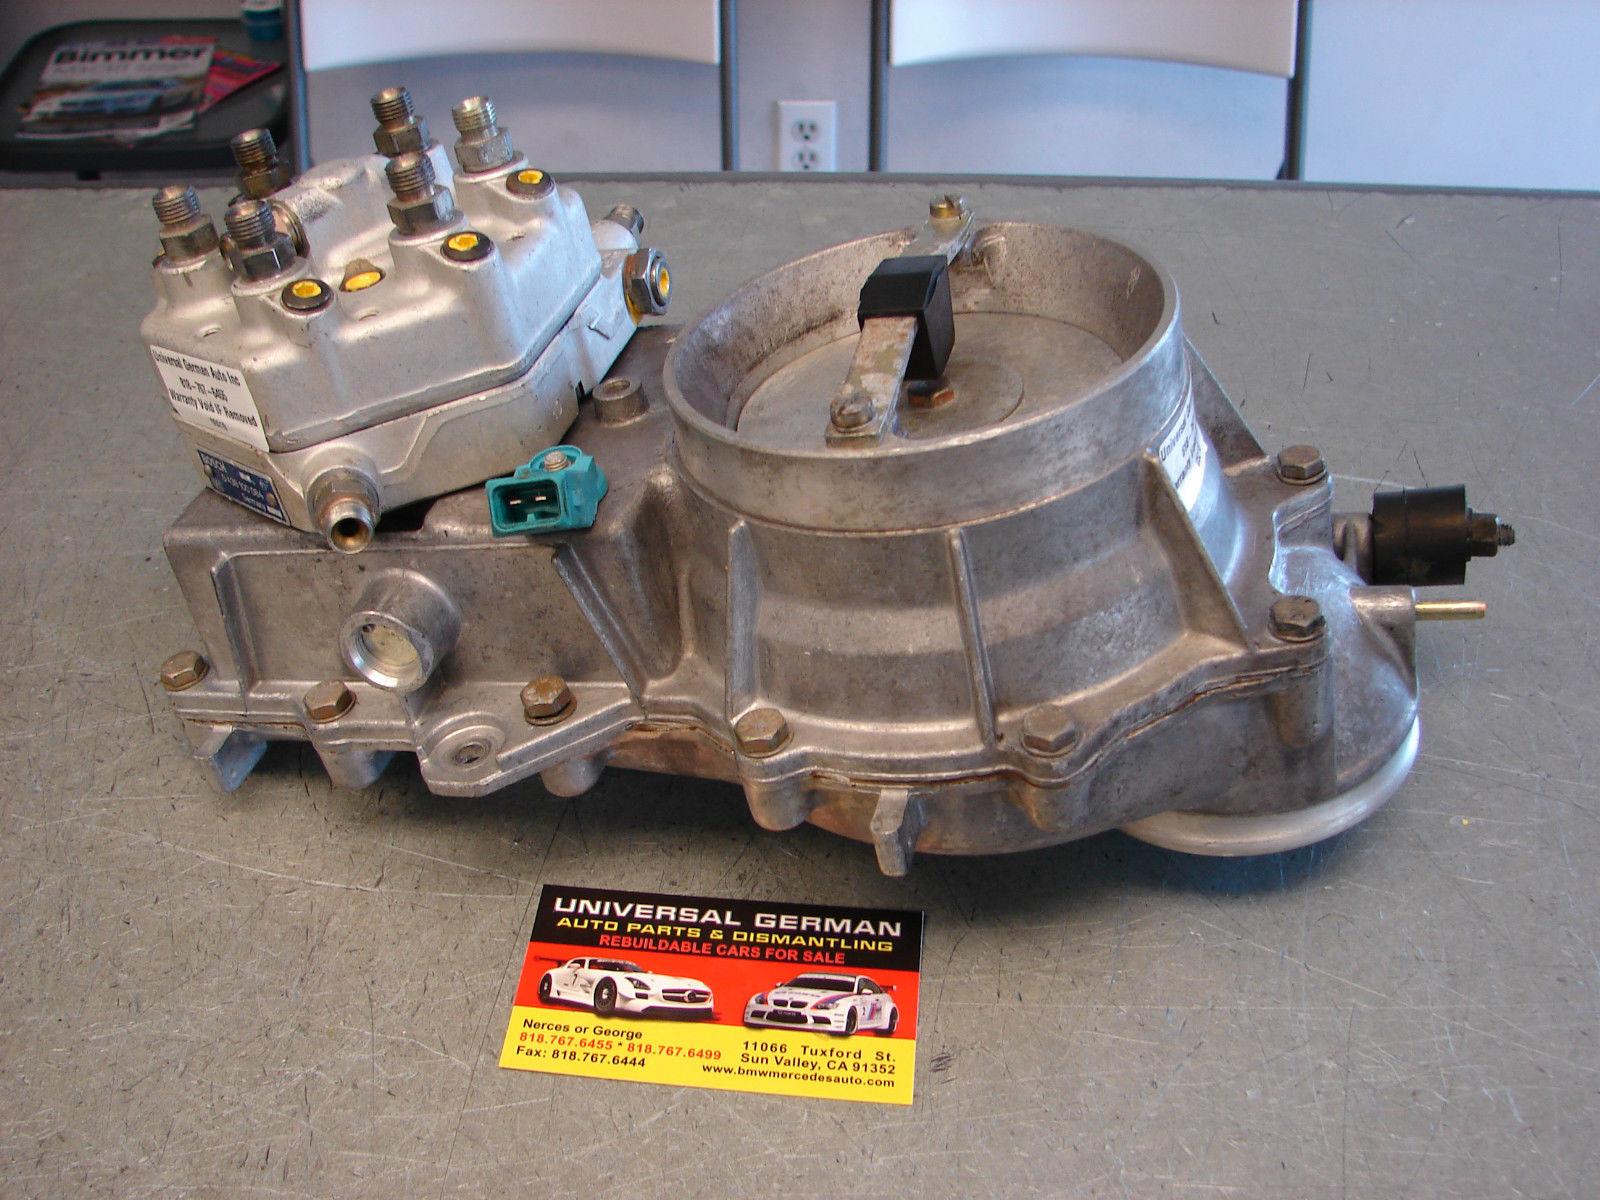 (COMPRO): Dosificador de combustível - W126 280S 1985 20pybg9